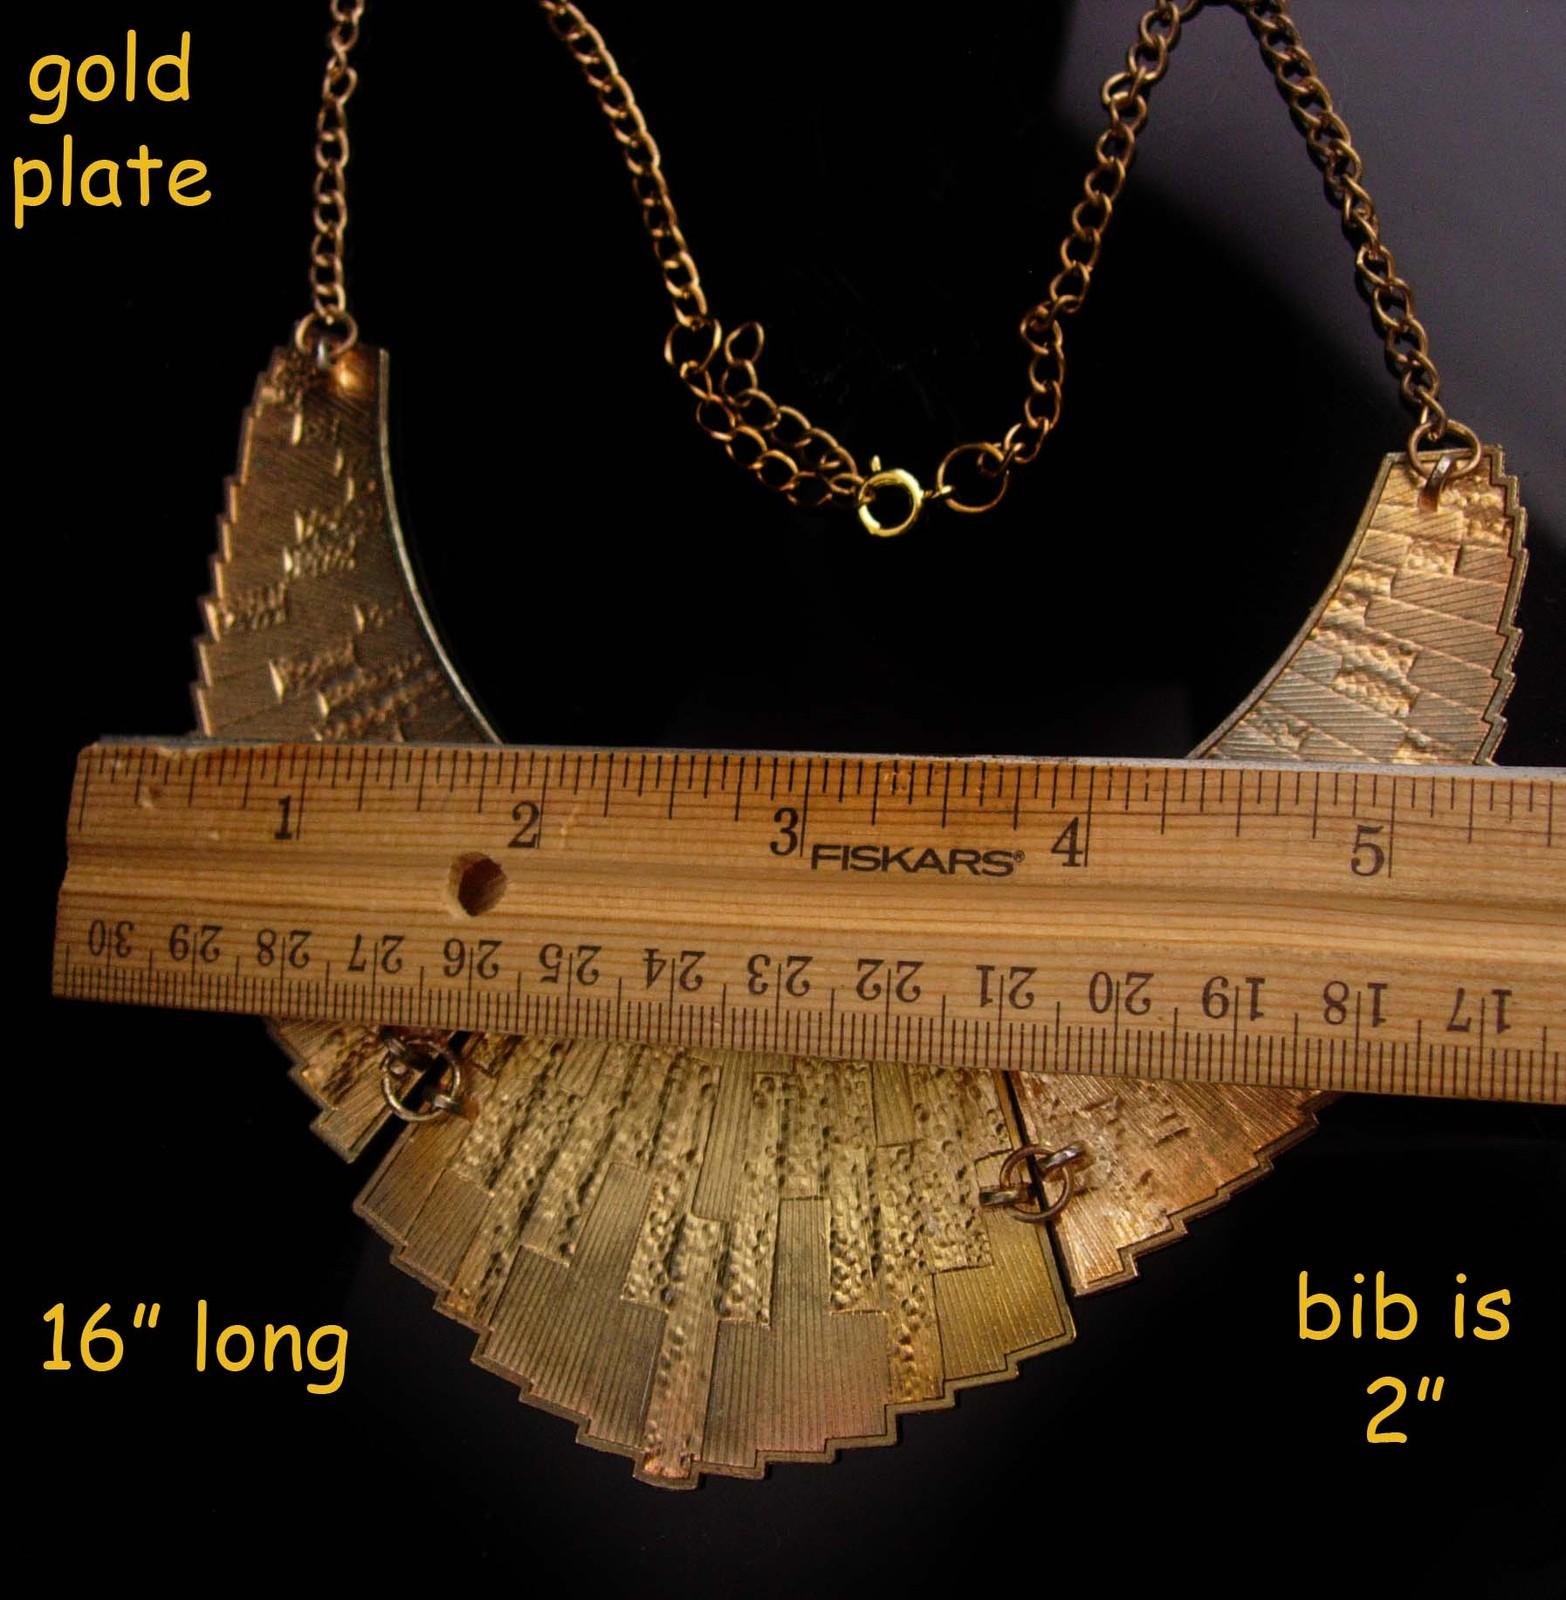 Vintage Cleopatra necklace - gold & Enamel statement collar - Goddess jewelry -